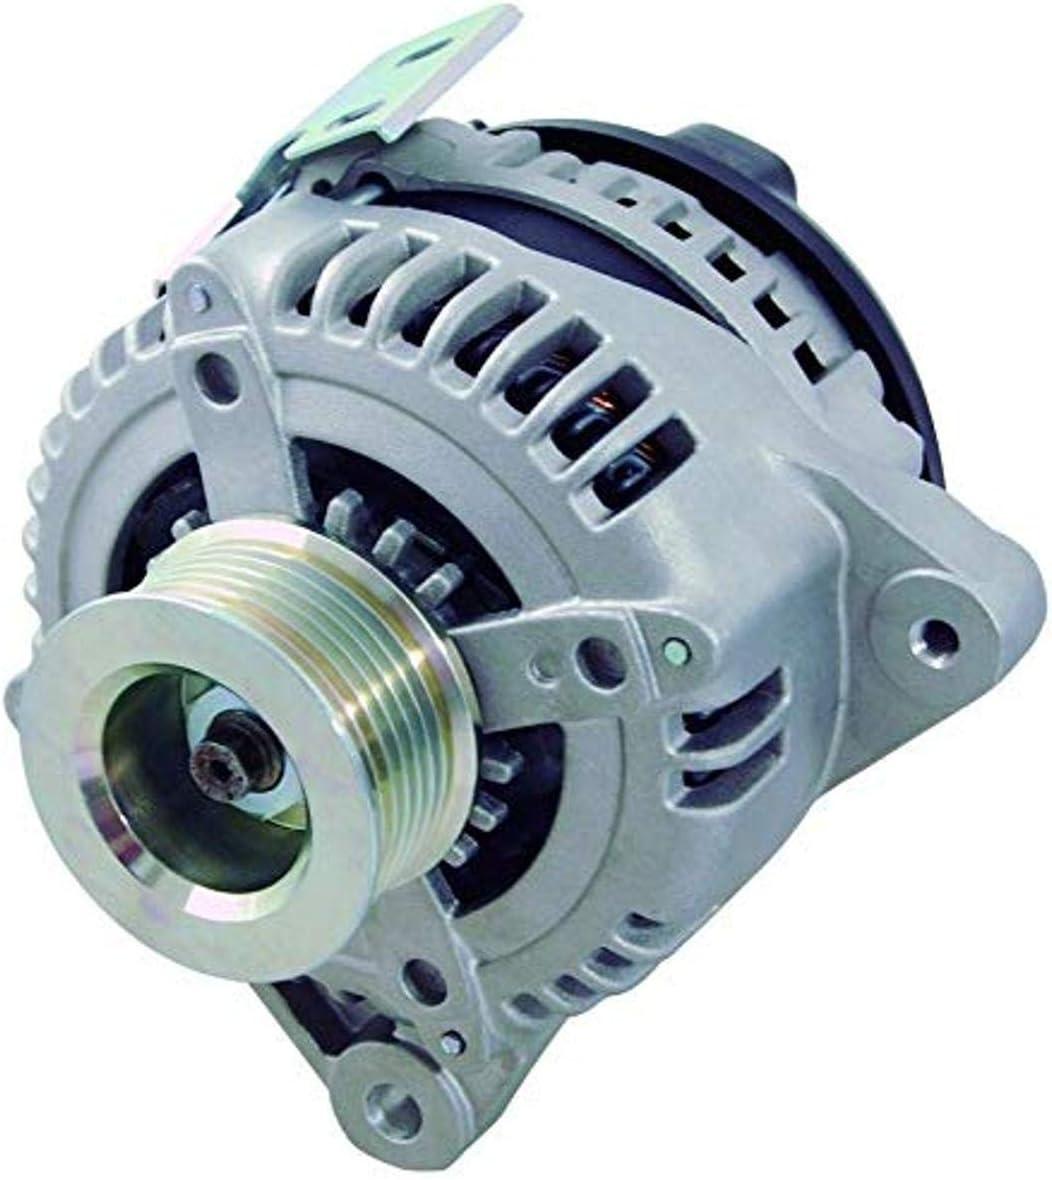 Premier Gear PG-11084 Professional Grade New Alternator